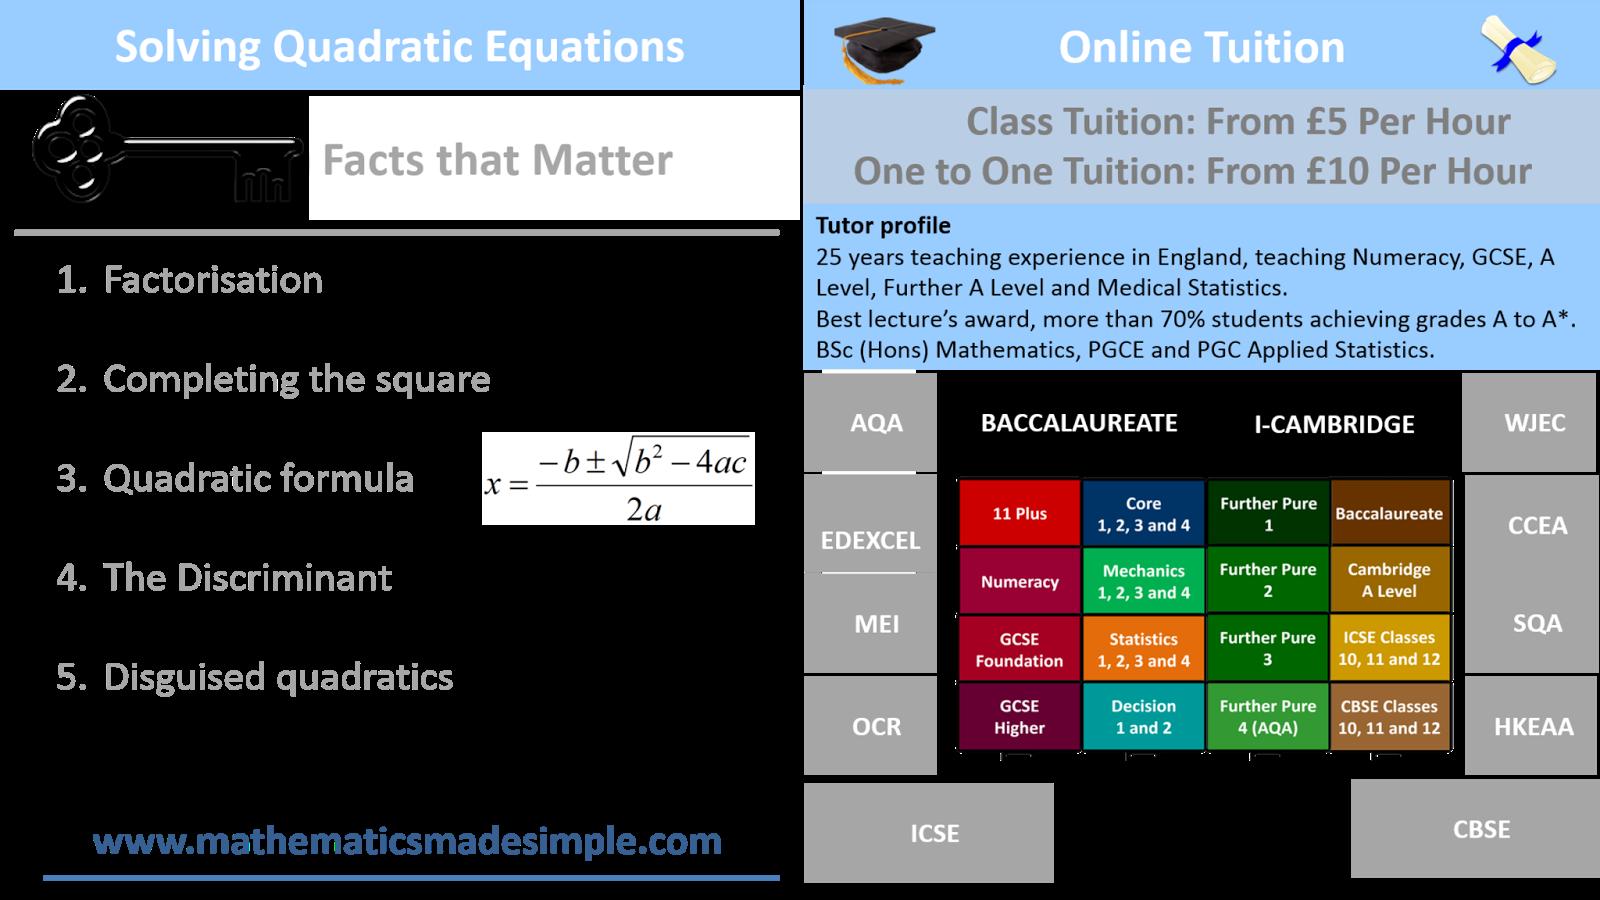 C1 Algebra Solving Quadratics Screenshot